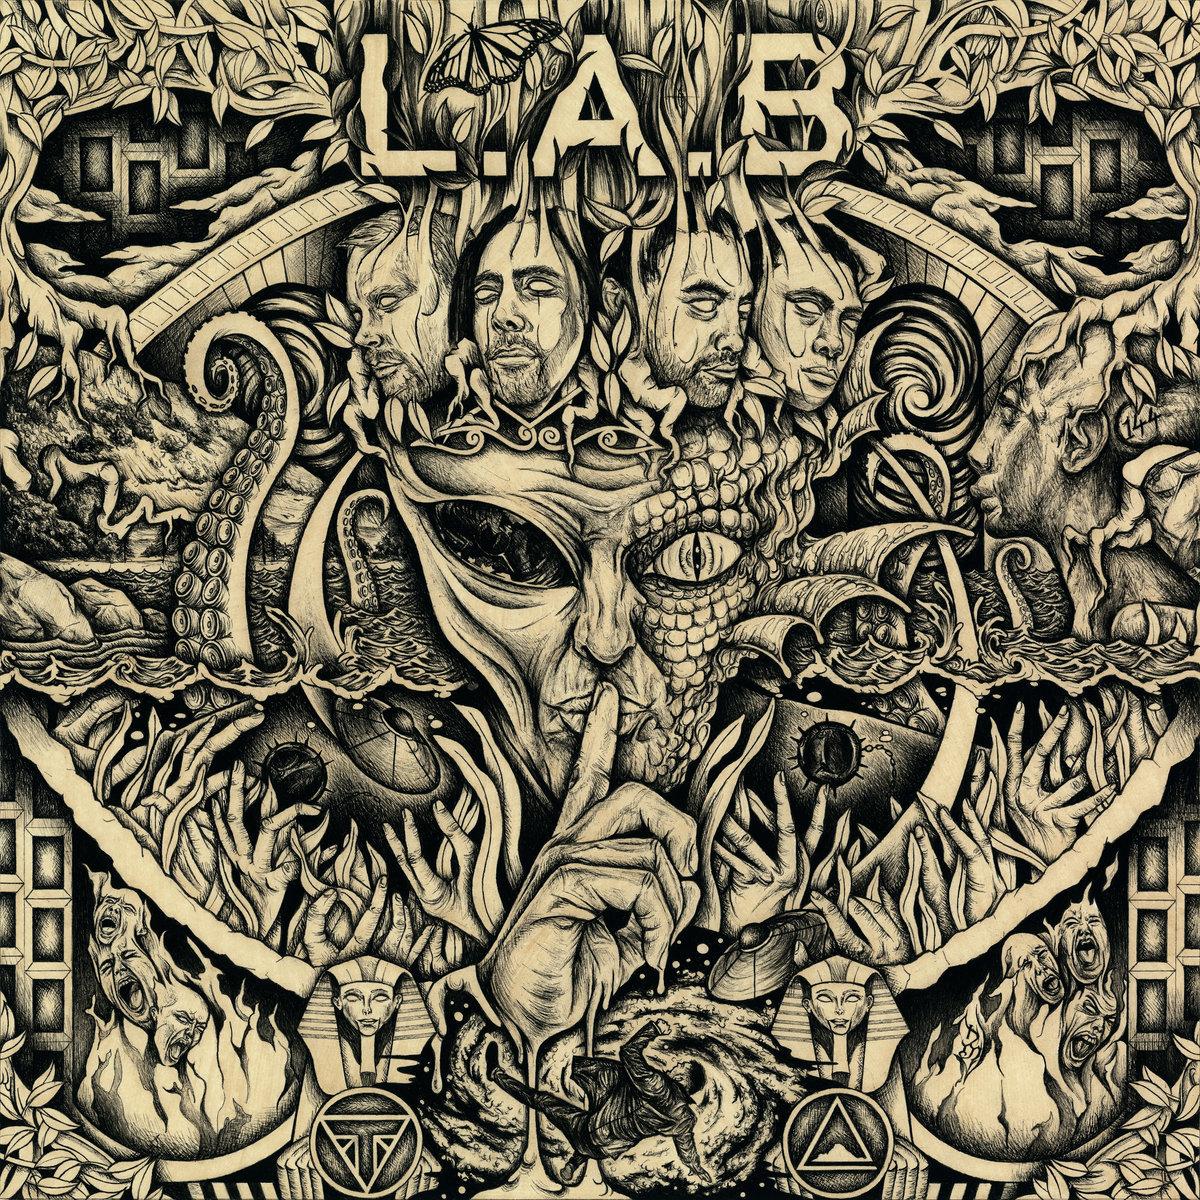 L.A.B [Limited Edition] (2LP) by L.A.B image